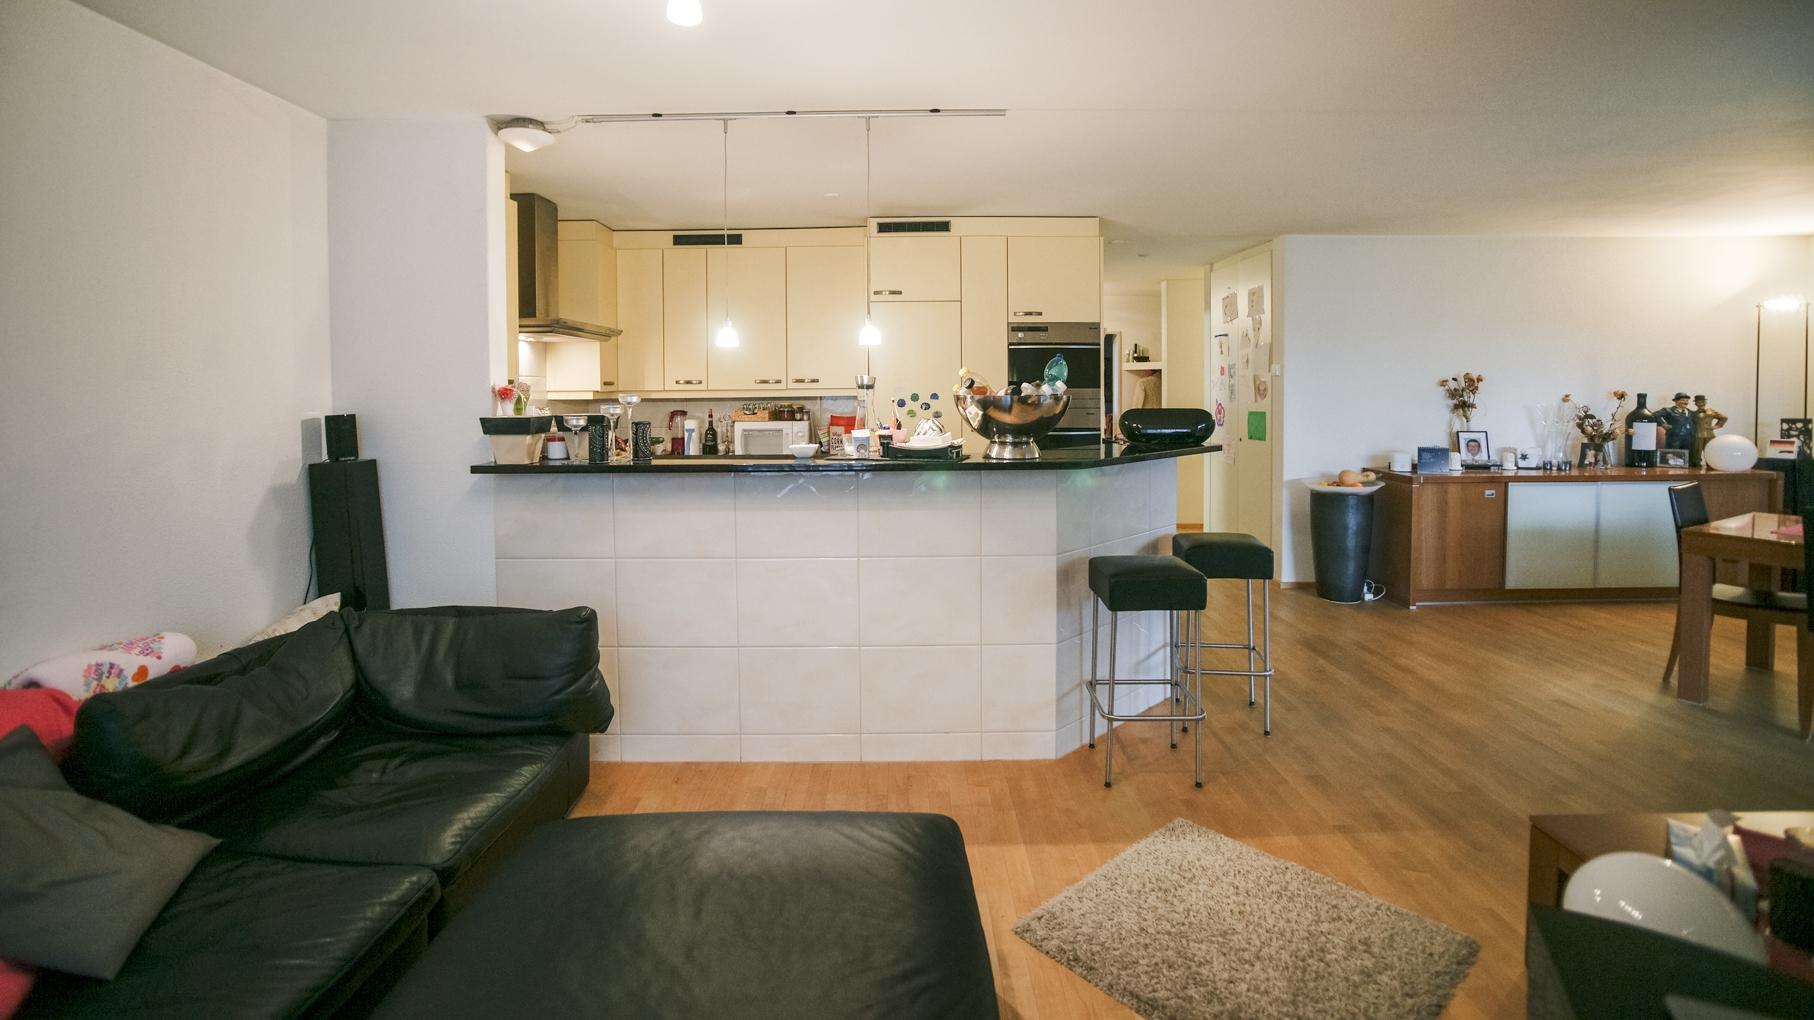 Boll_Immobilien_Haus_11.jpg